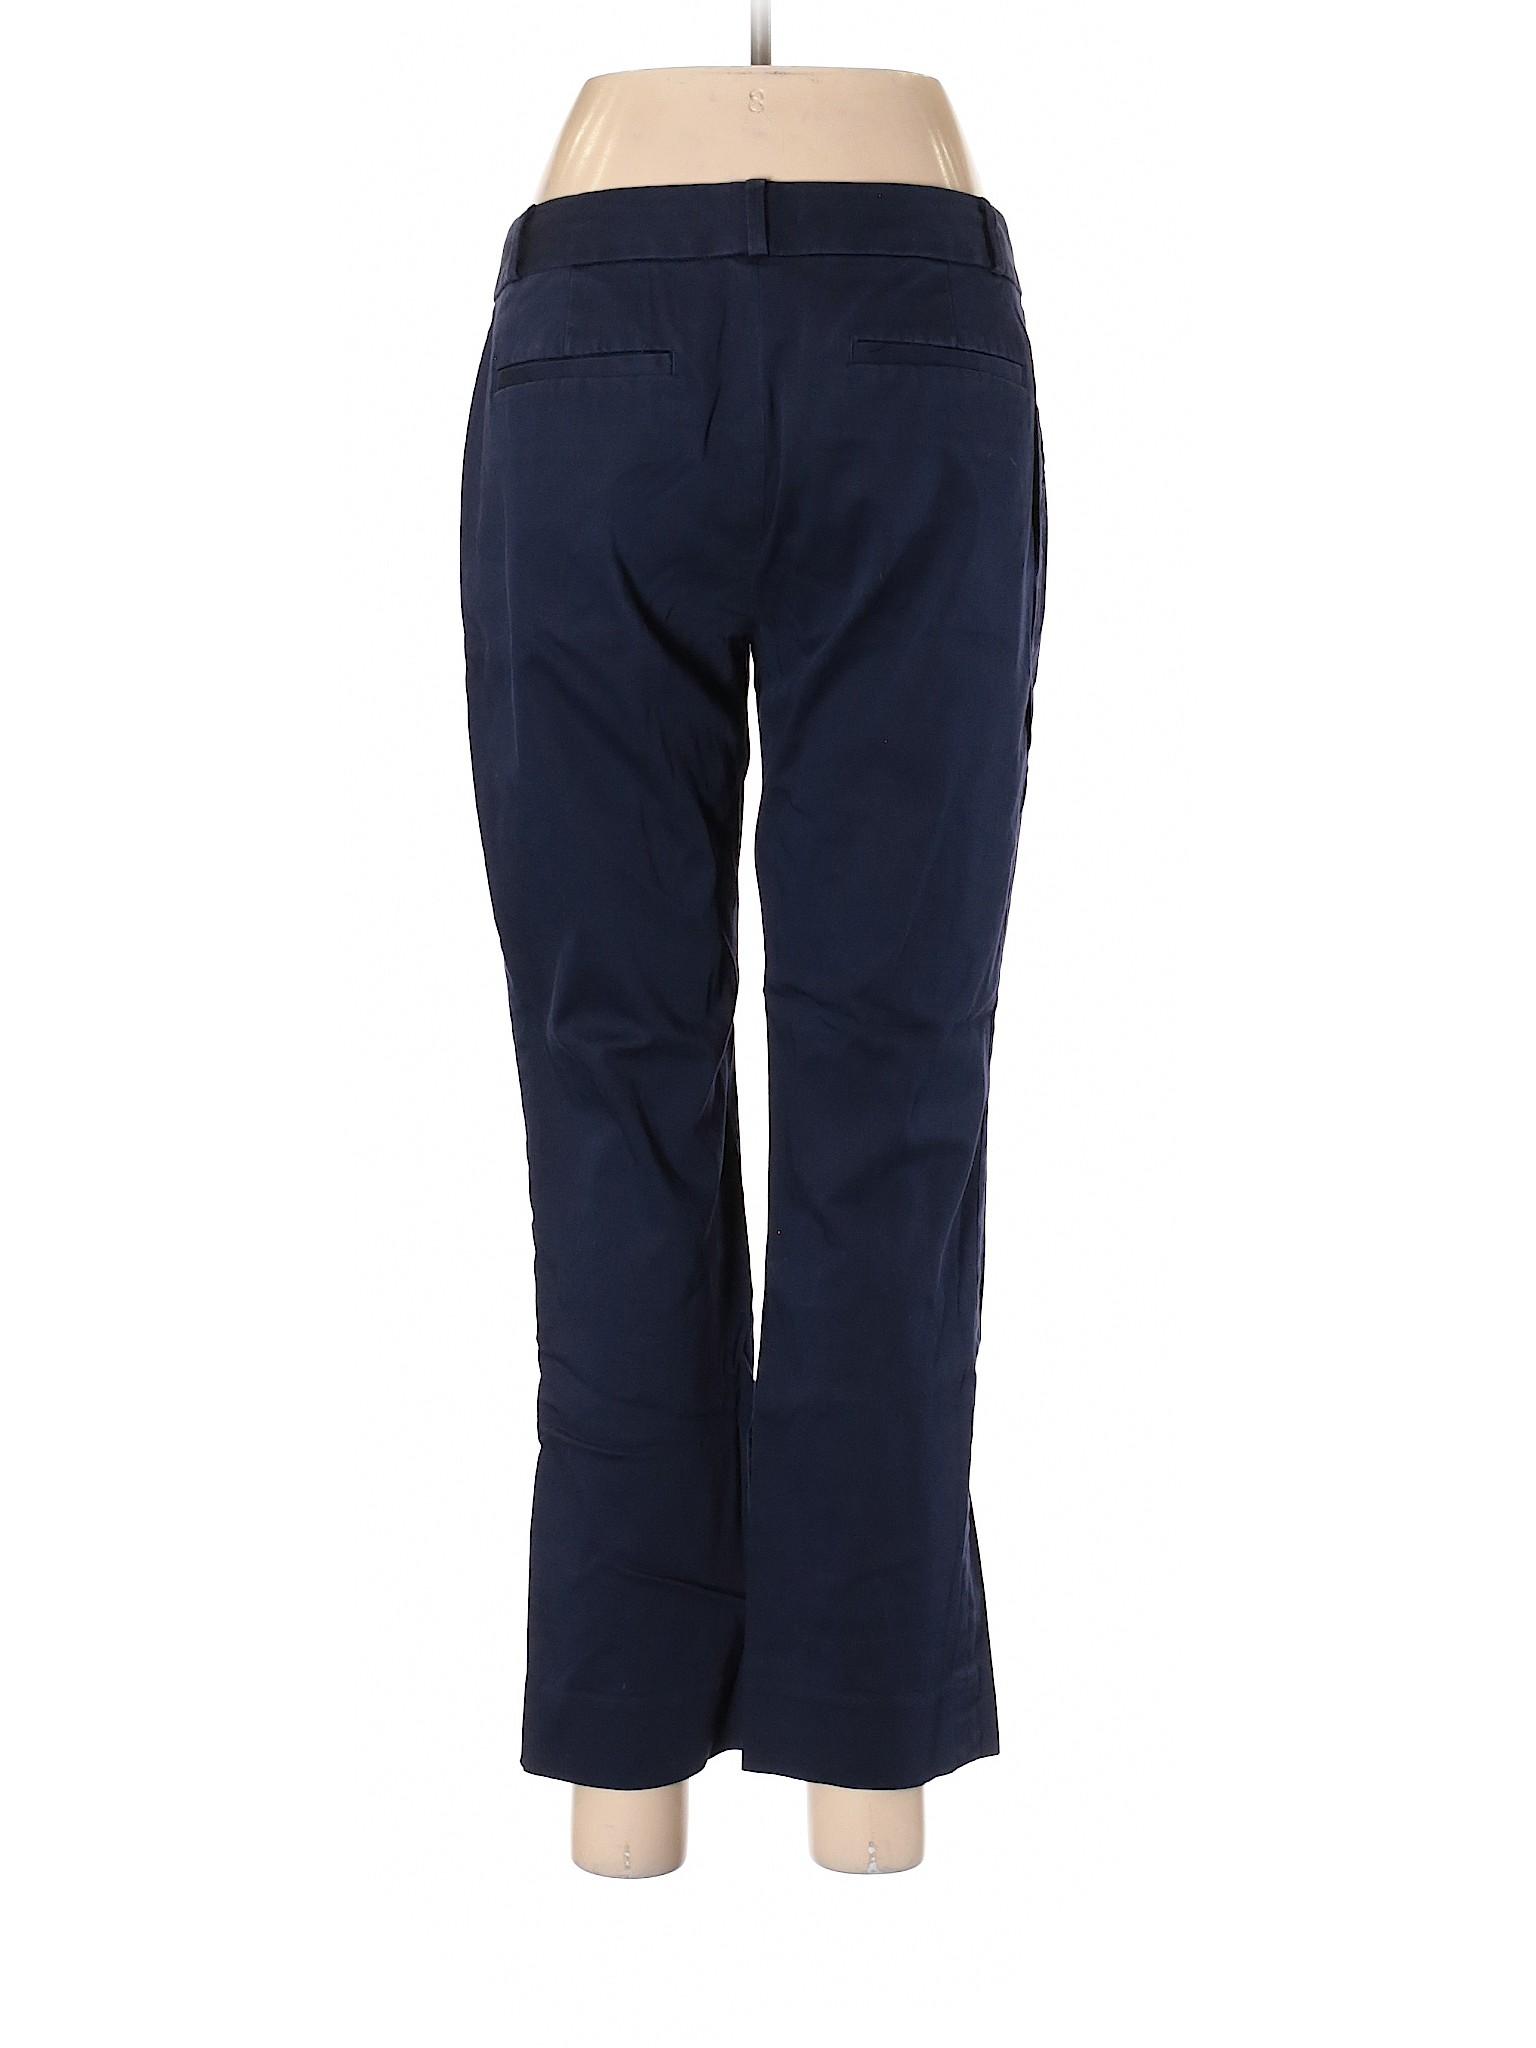 Republic Boutique winter Dress Pants Banana BEwaqES